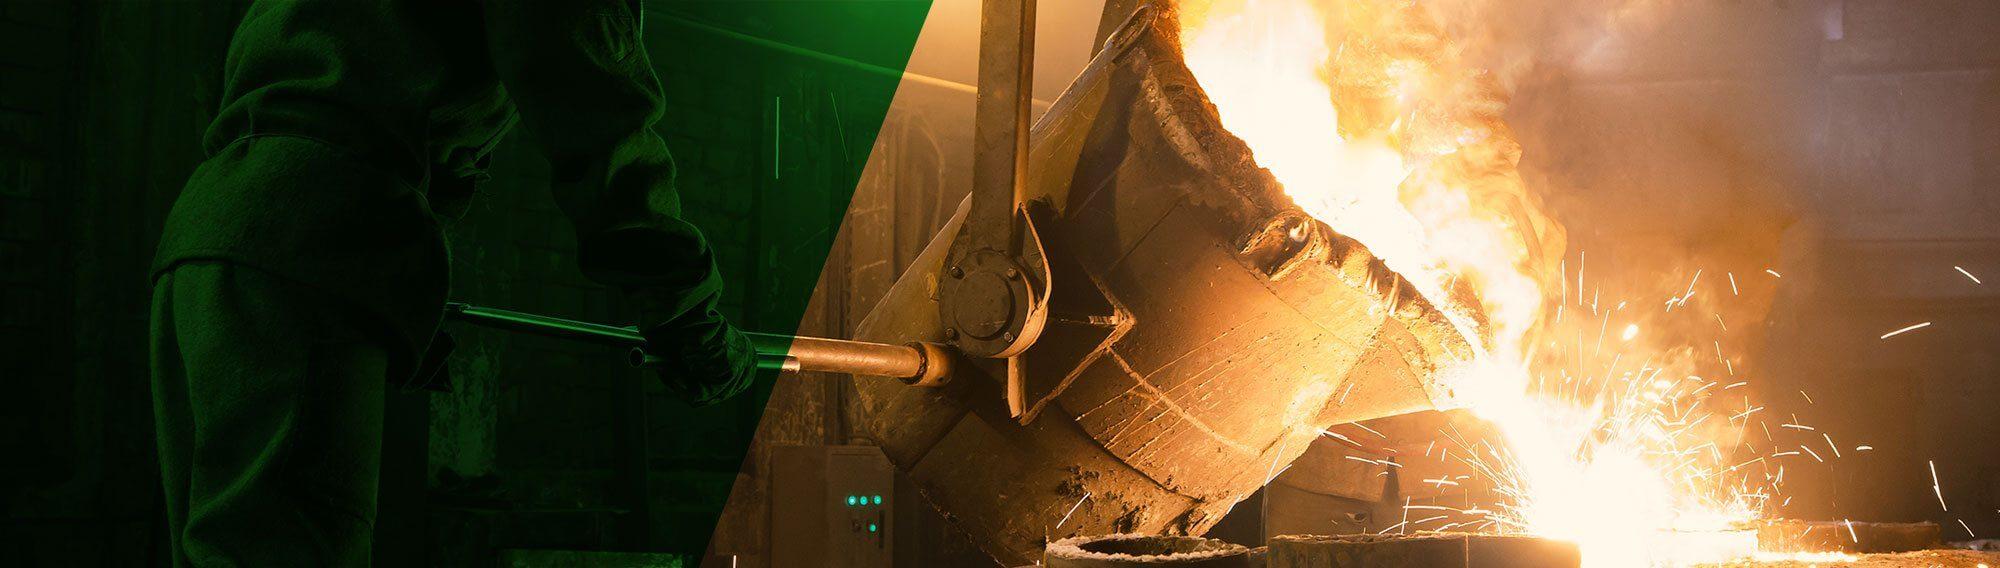 Steel Stockholders